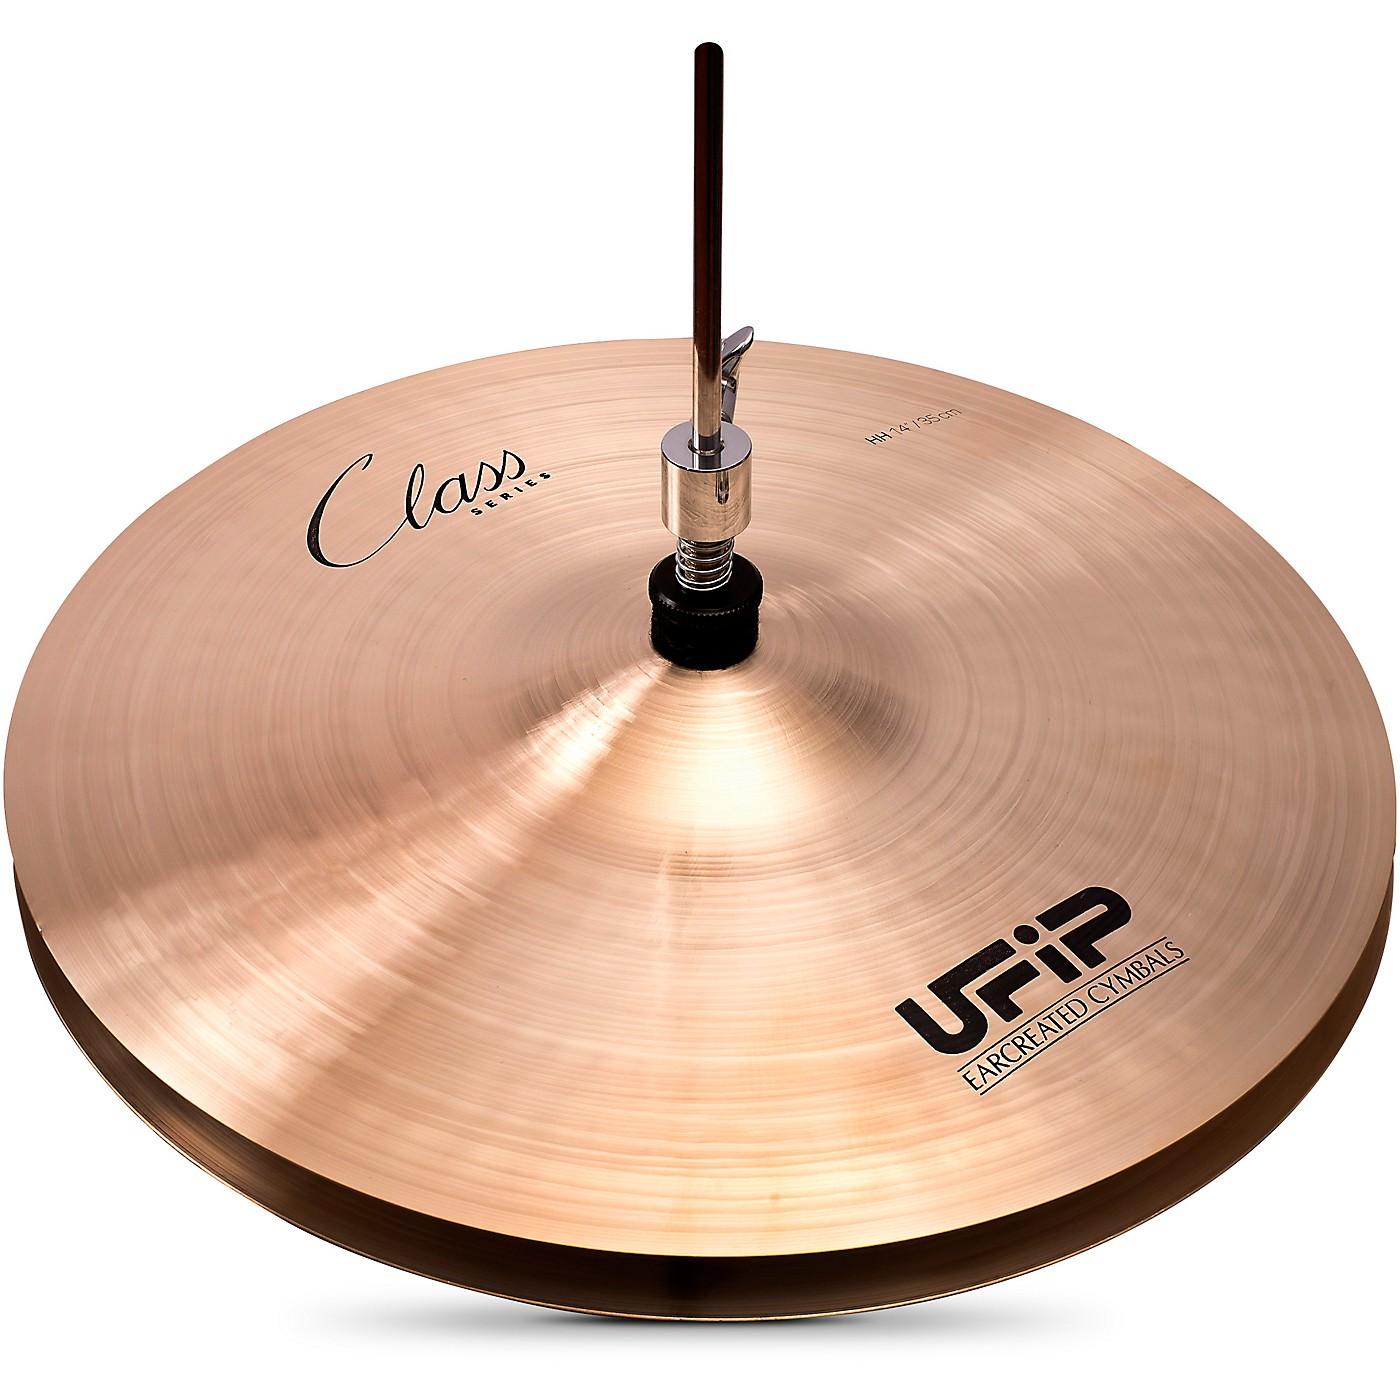 UFIP Class Series Heavy Hi-Hat Cymbal Pair thumbnail